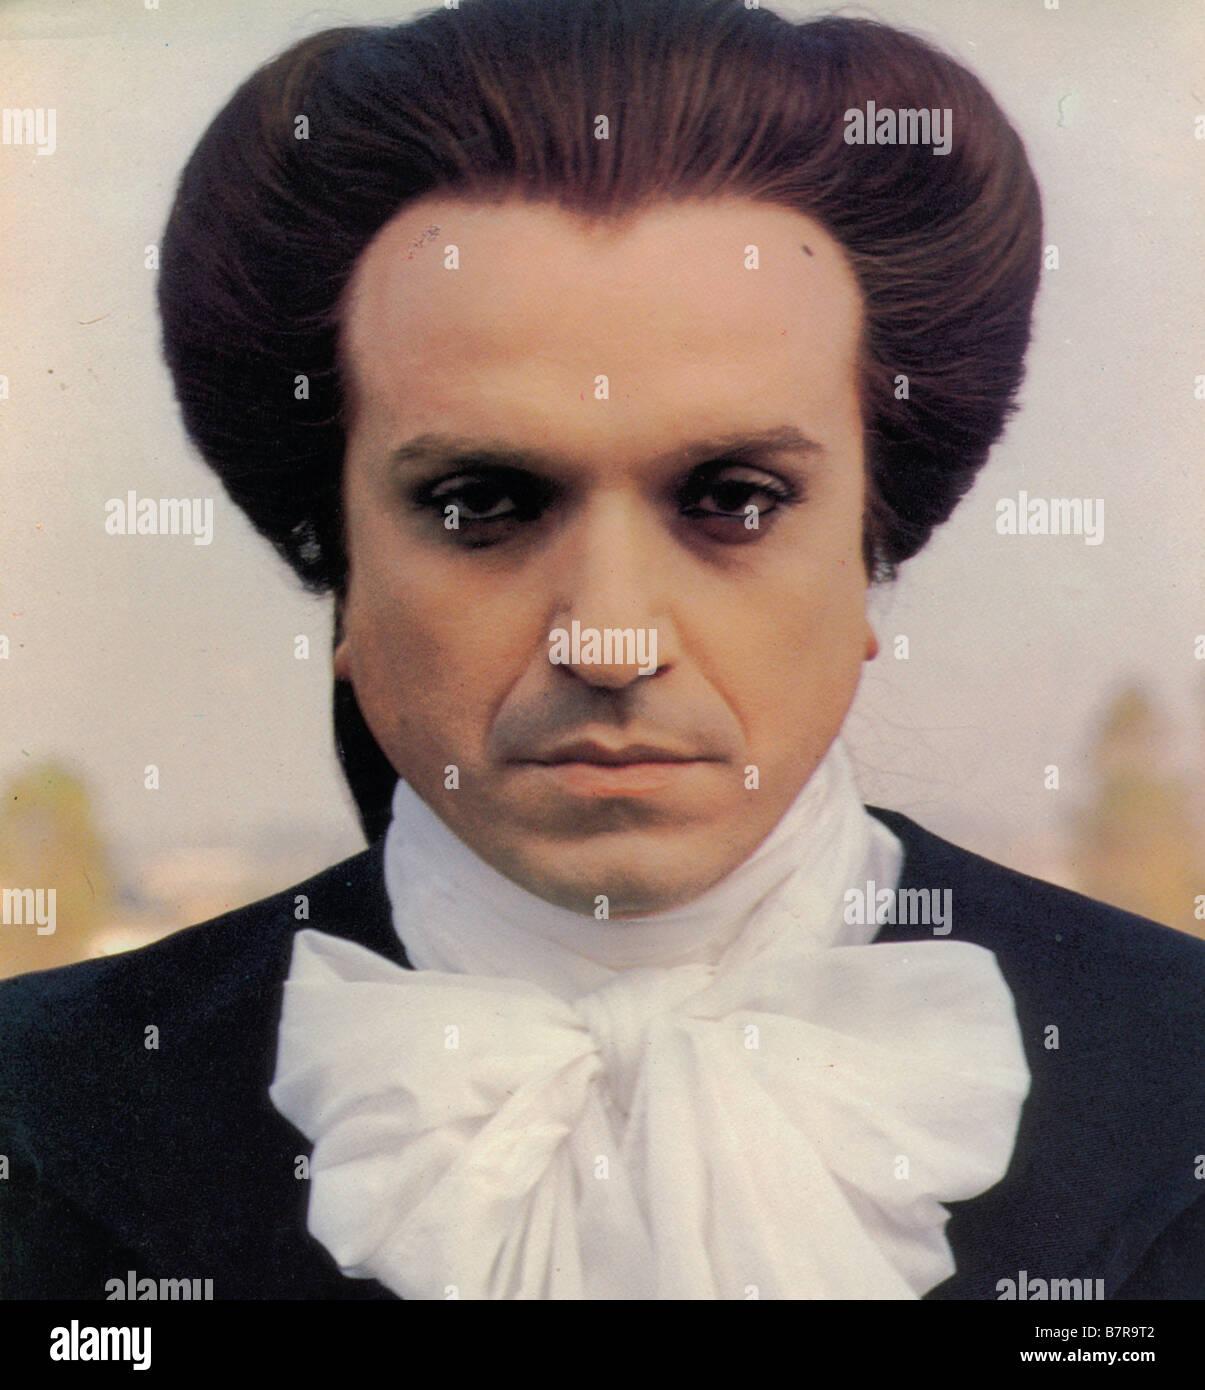 Don Giovanni Don Giovanni Année 1979 France Ruggero Raimondi France 1979 Réalisateur Joseph Losey Photo Stock